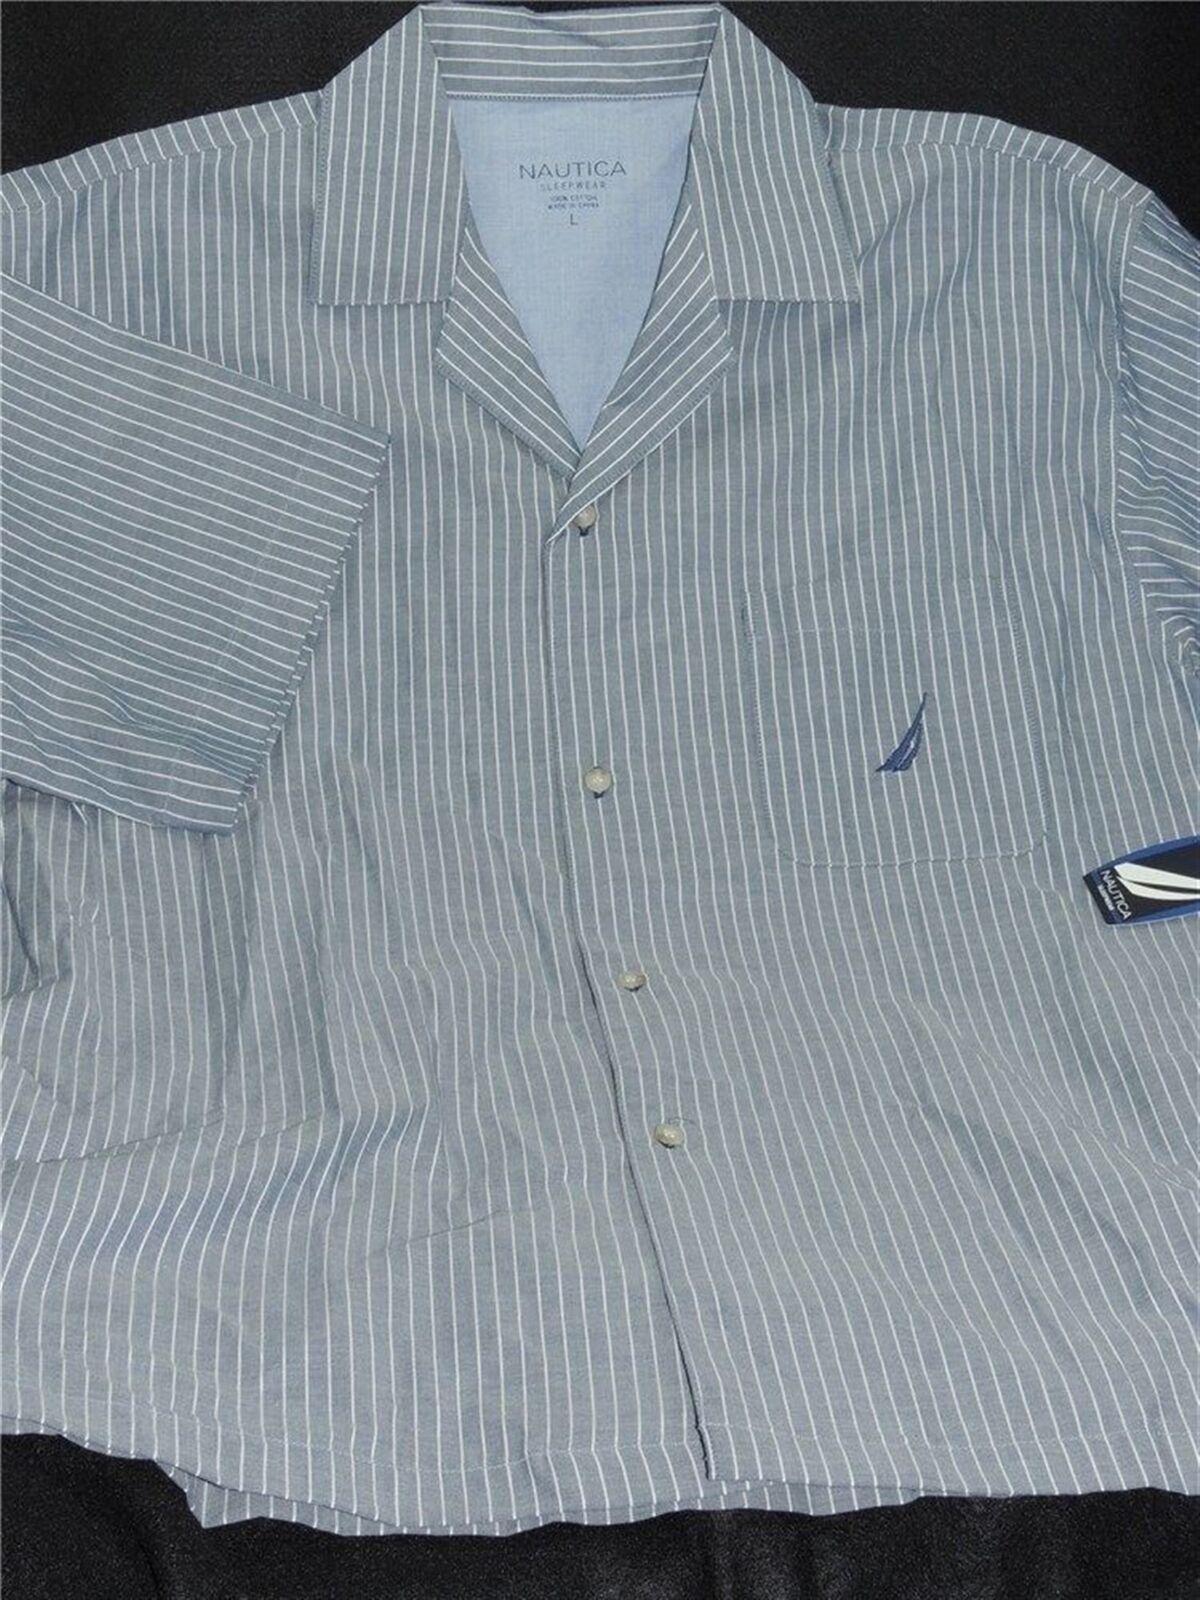 Nautica Men's Lounge Shirt Bay Spring Navy Short Sleeve 100% Cotton Sleepwear L